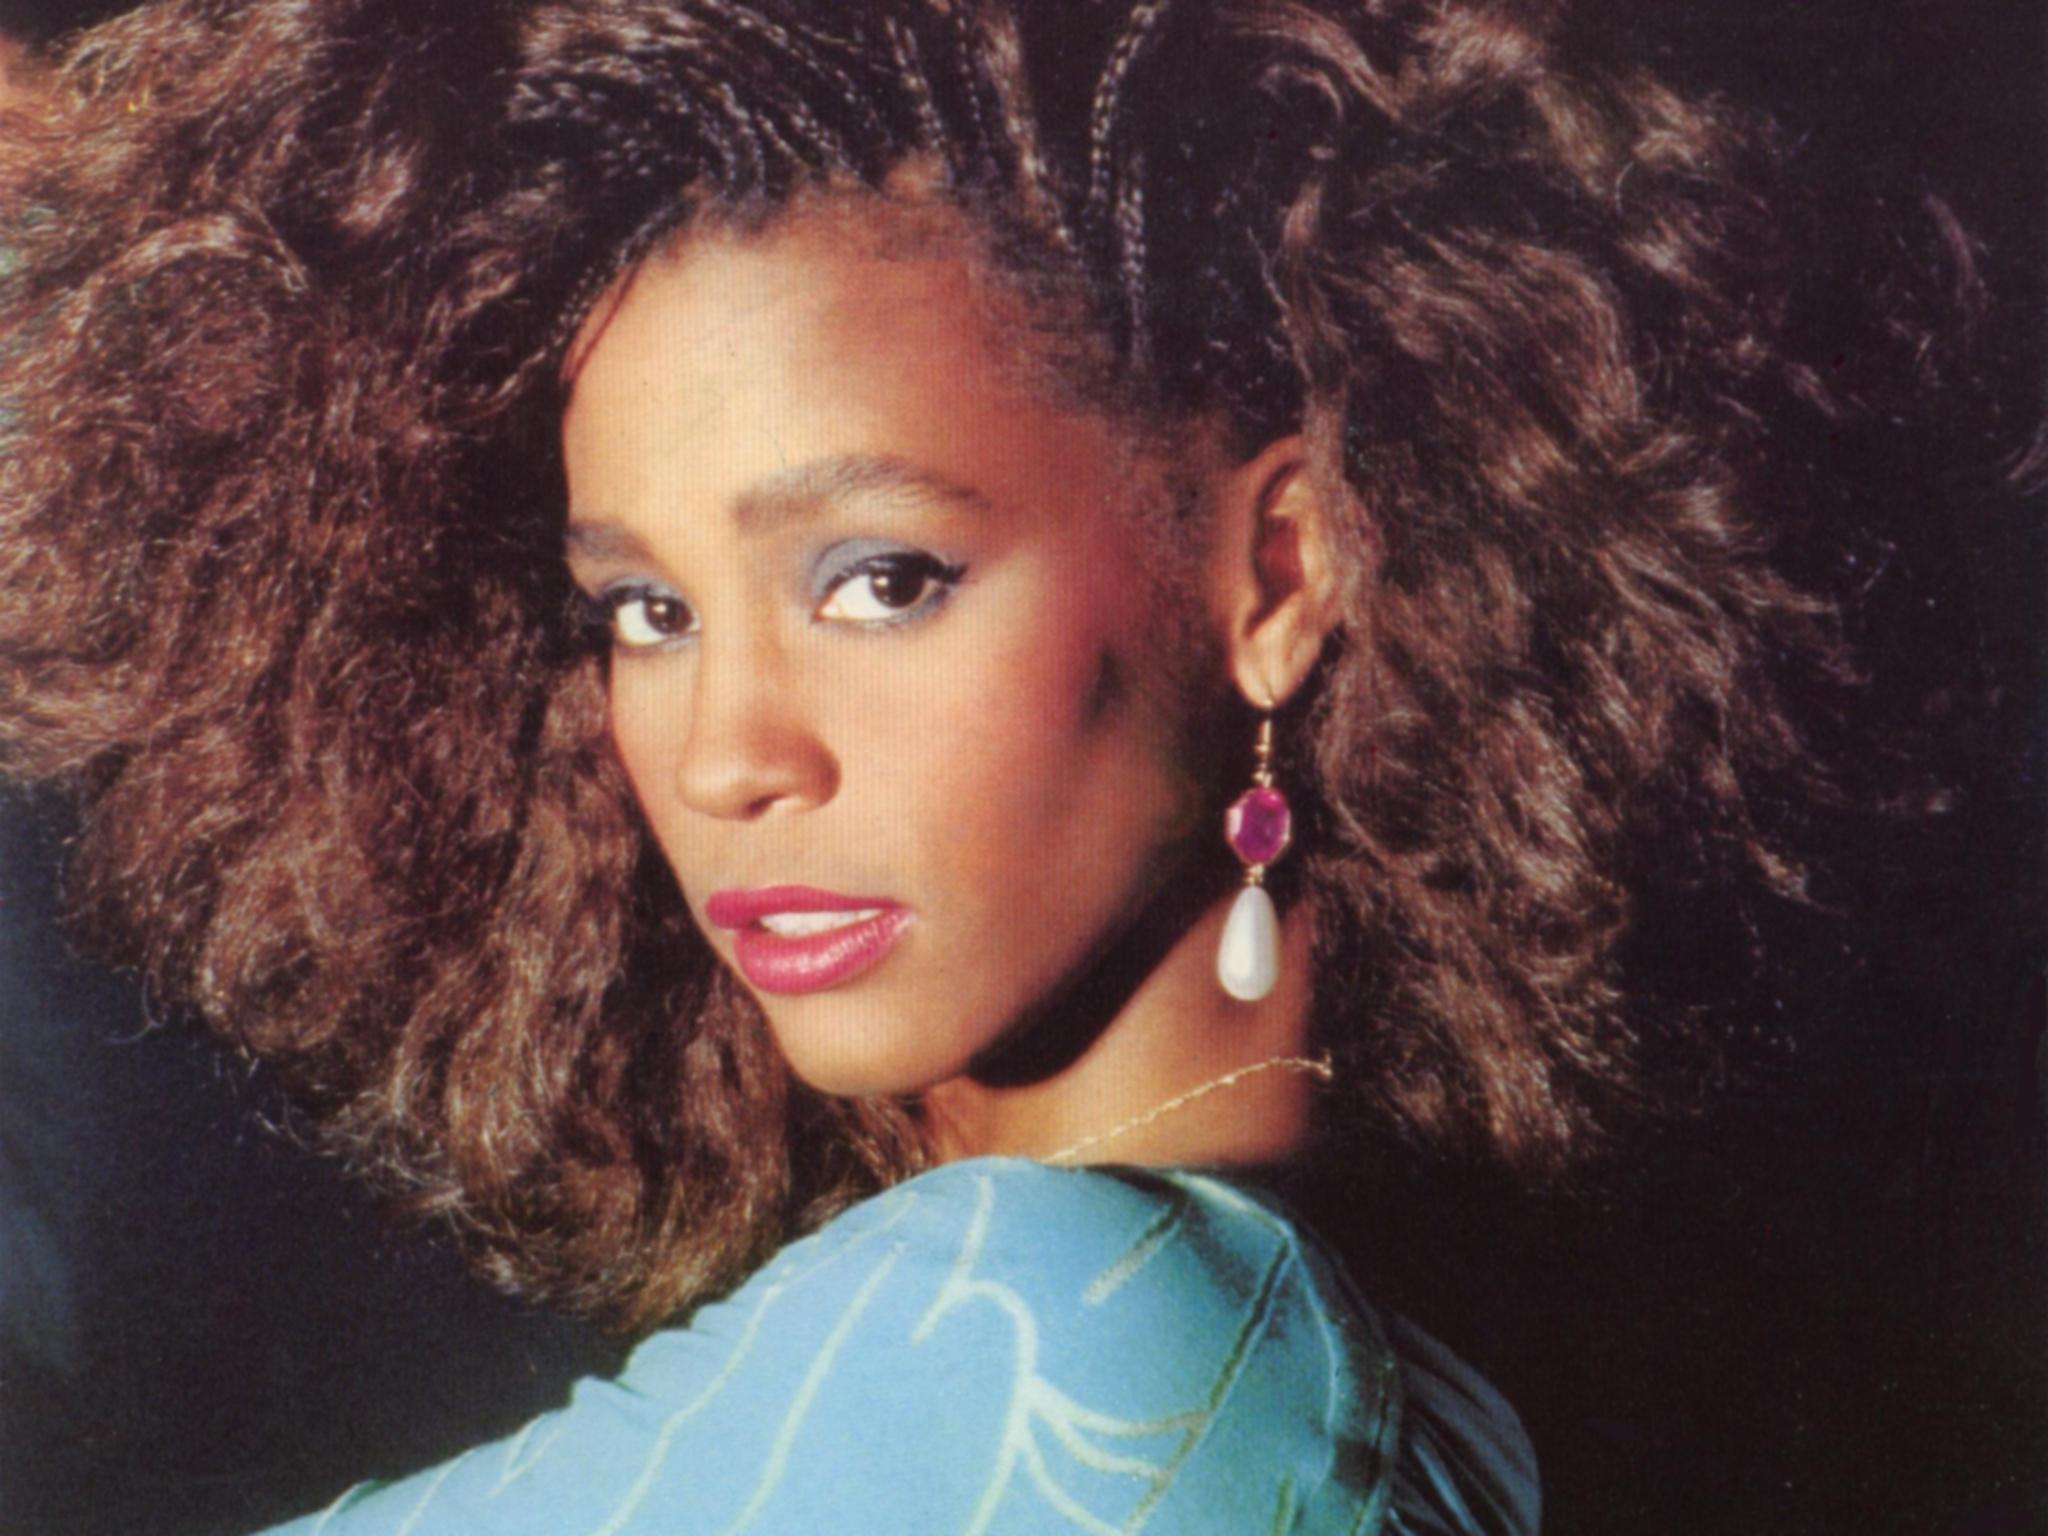 'I Wanna Dance With Somebody' – Whitney Houston